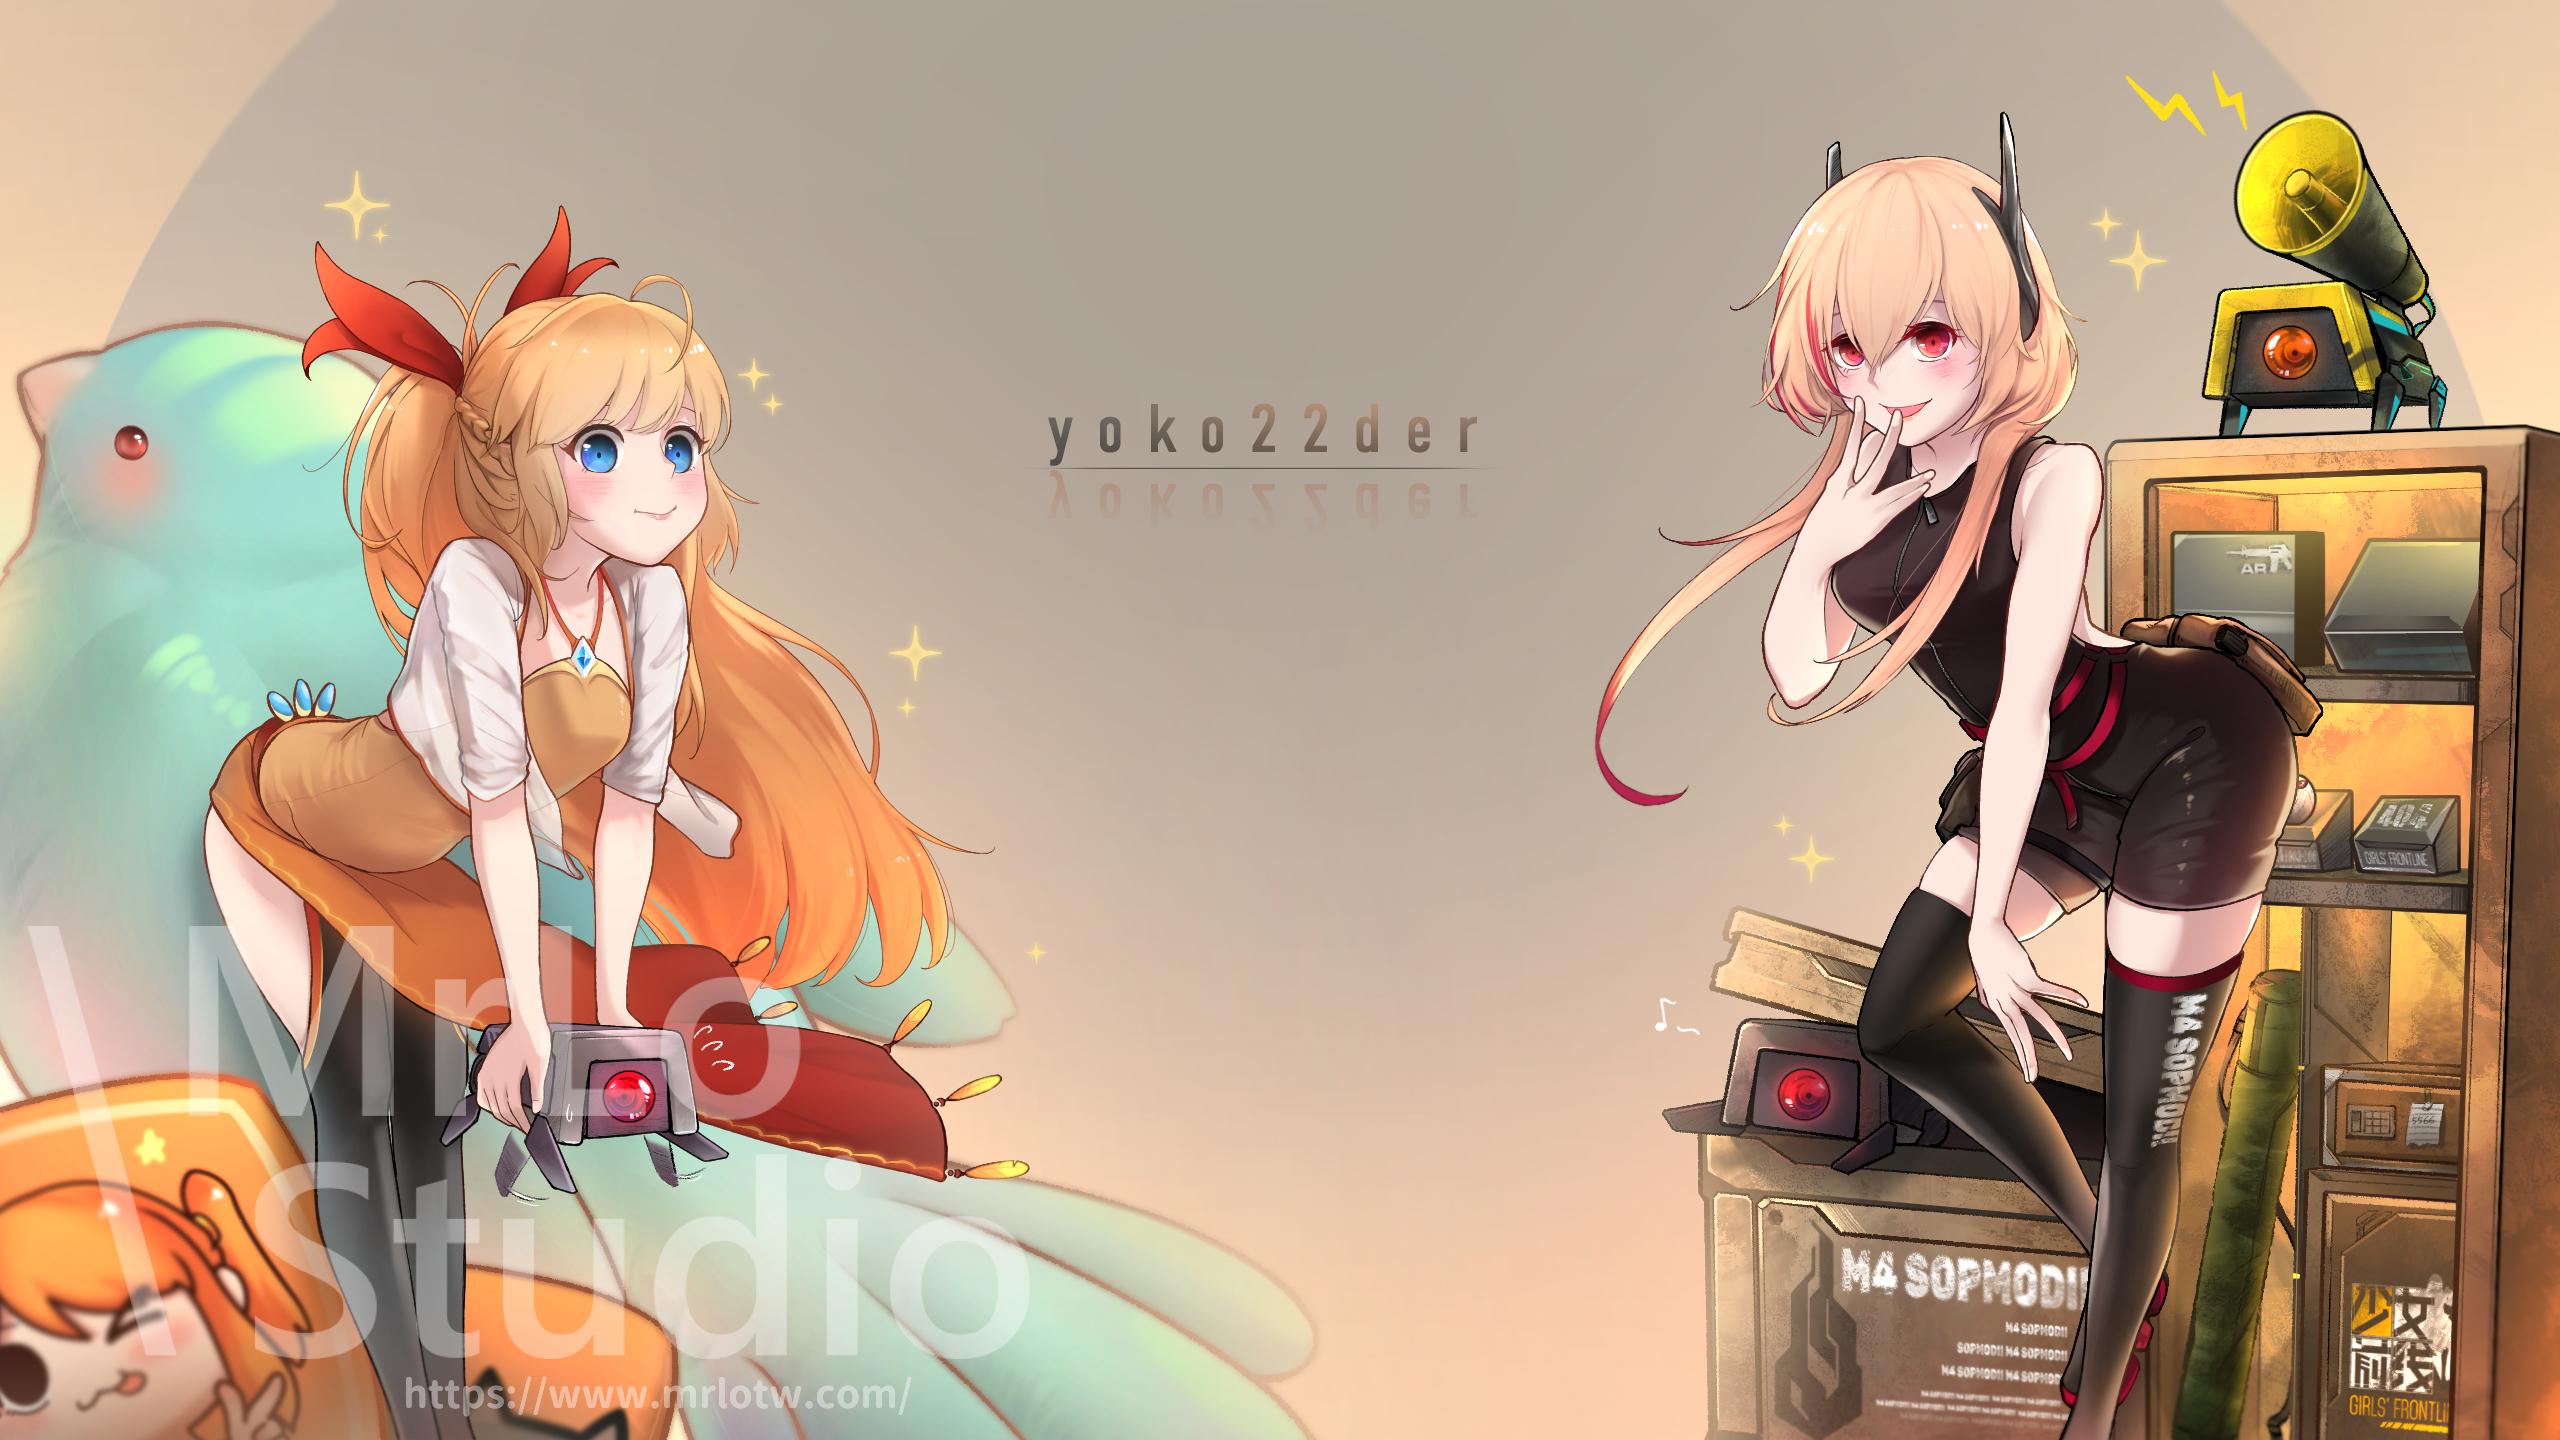 桌布插畫|委託人:yoko22der